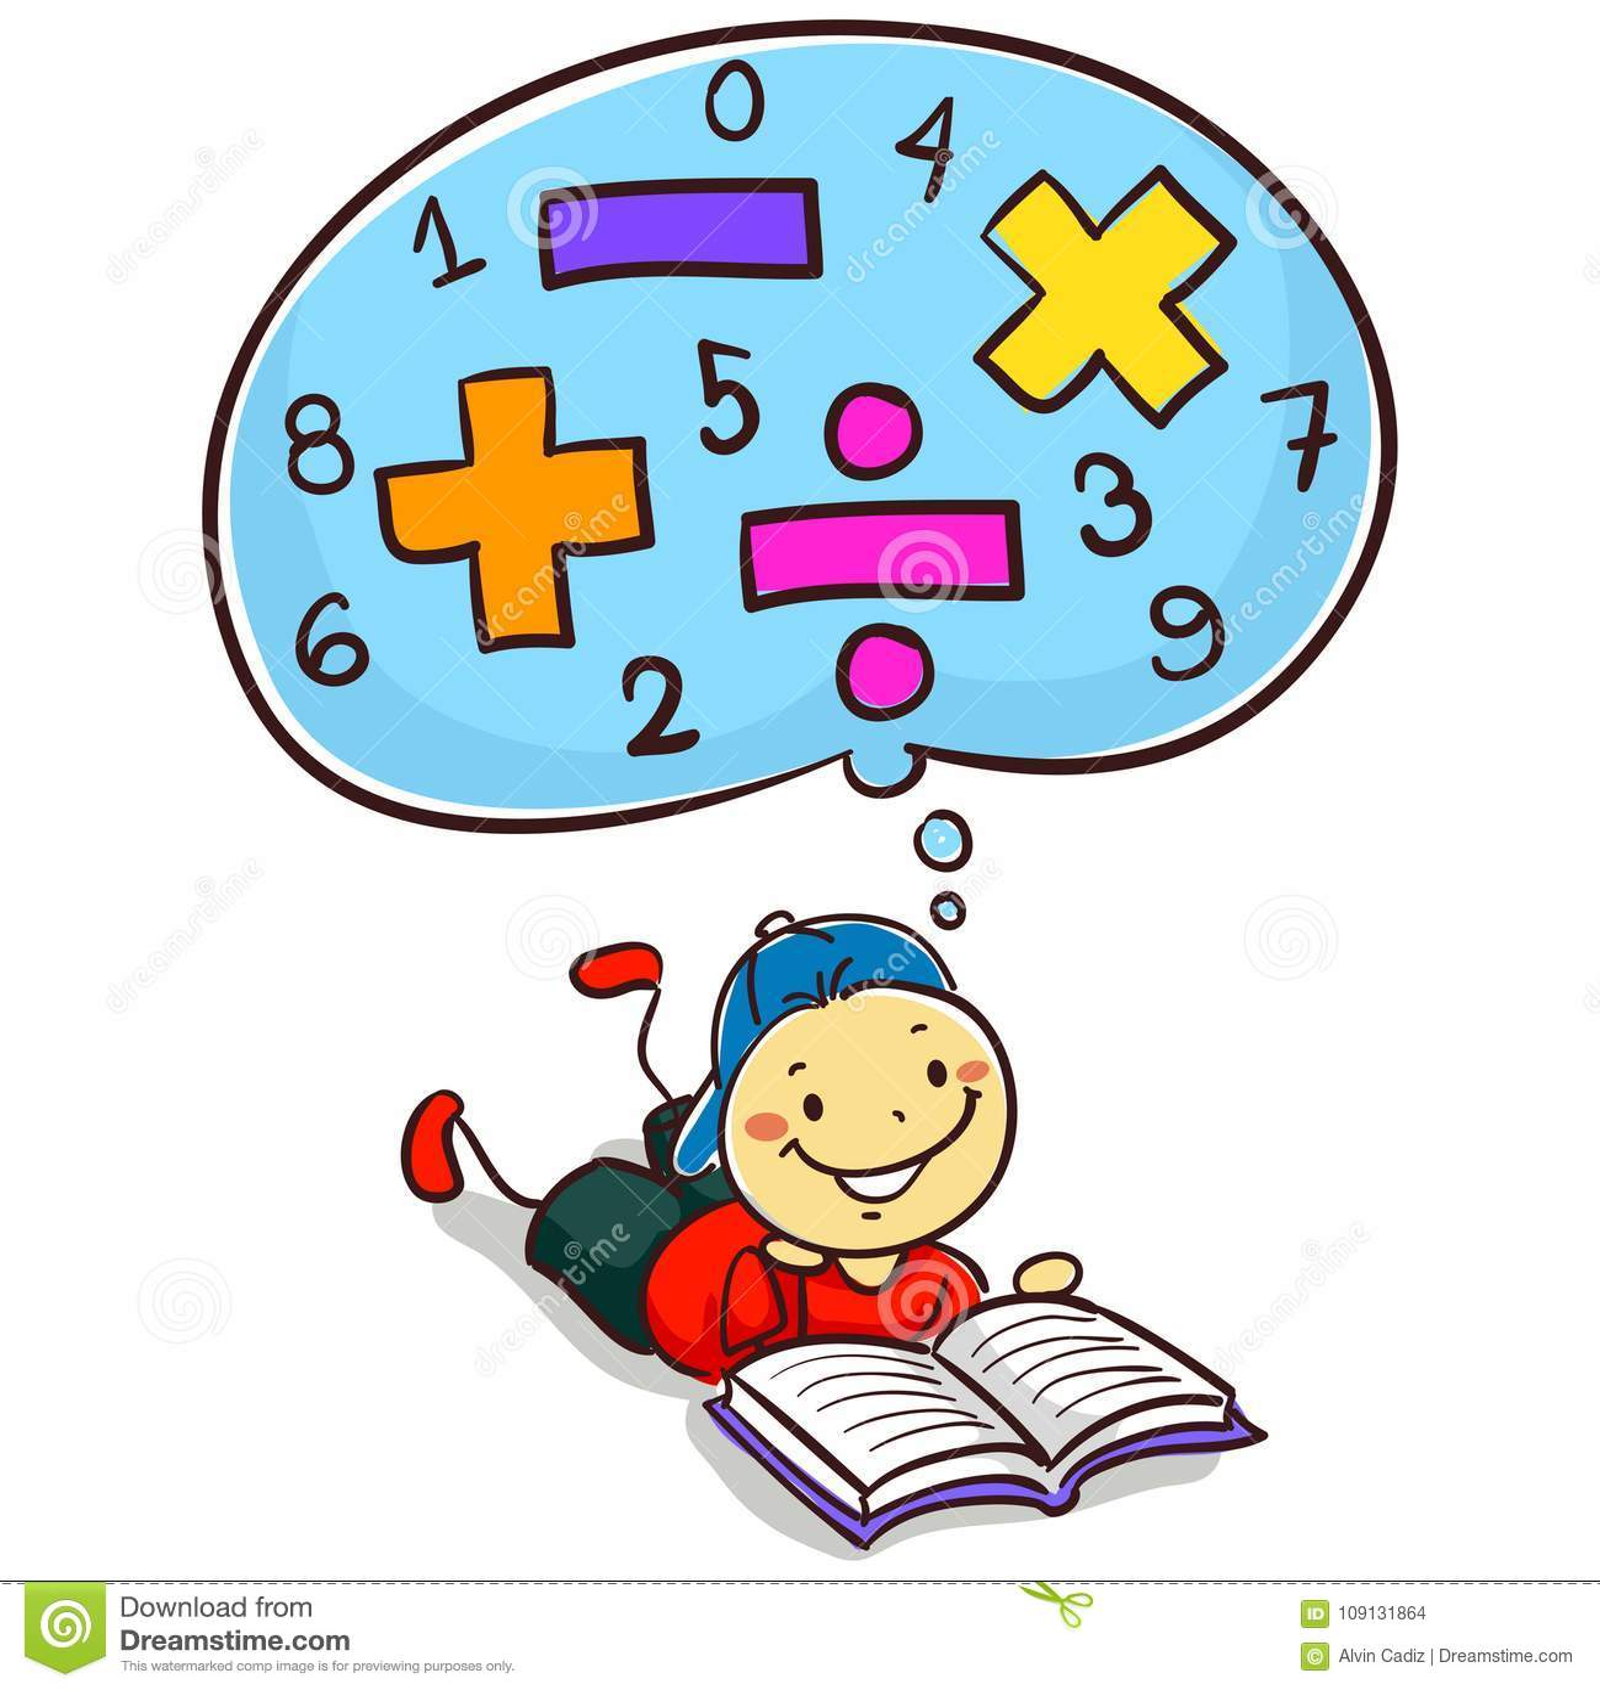 Kid Boy Reading Book About Mathematics Stock Vector - Illustration ...